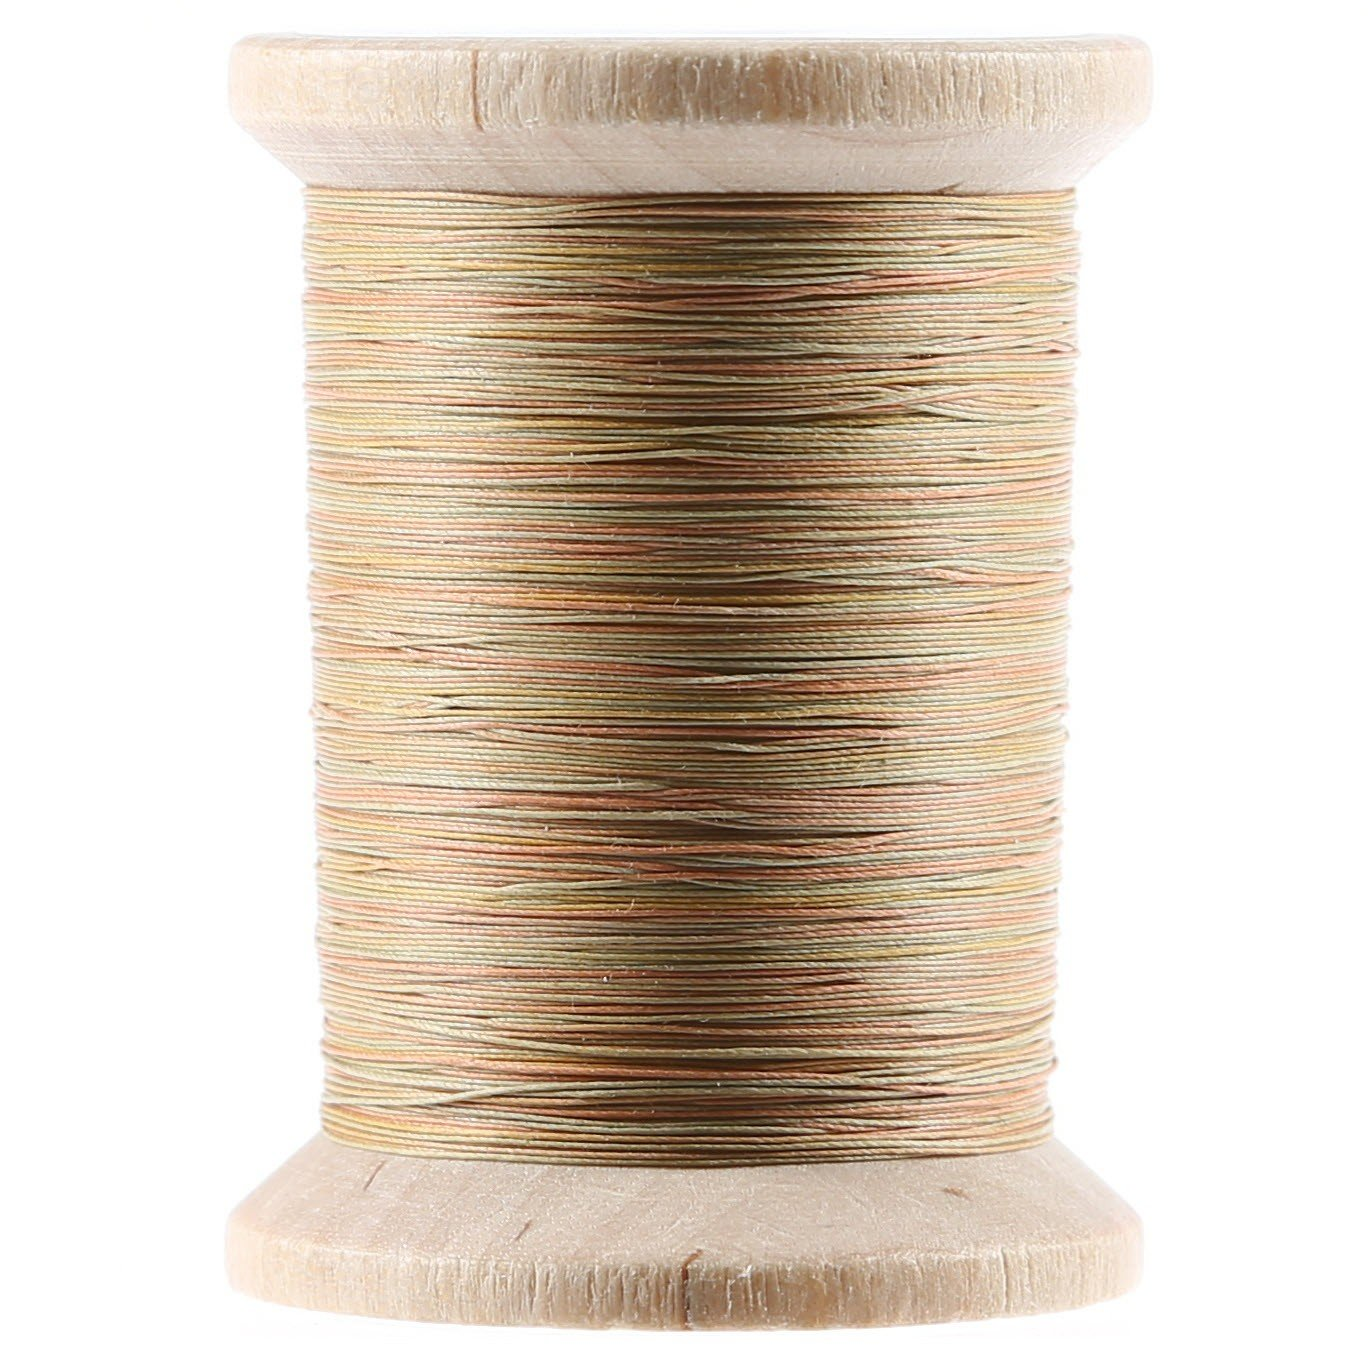 Variegated Cotton Hand Quilting Thread 400yds Dusk